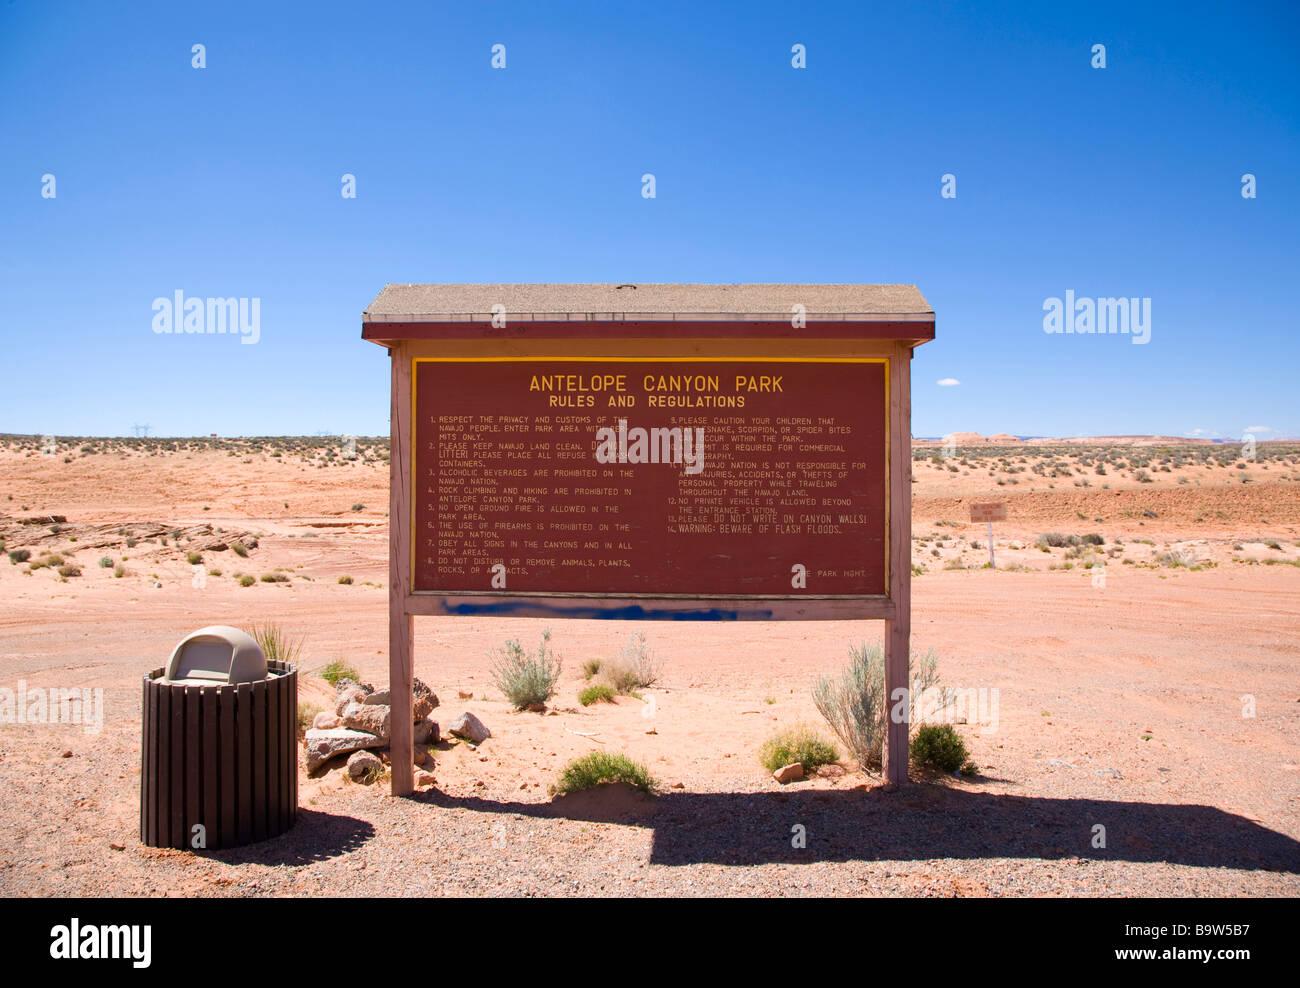 Antelope Canyon rules and regulations sign near Page, Arizona, USA - Stock Image